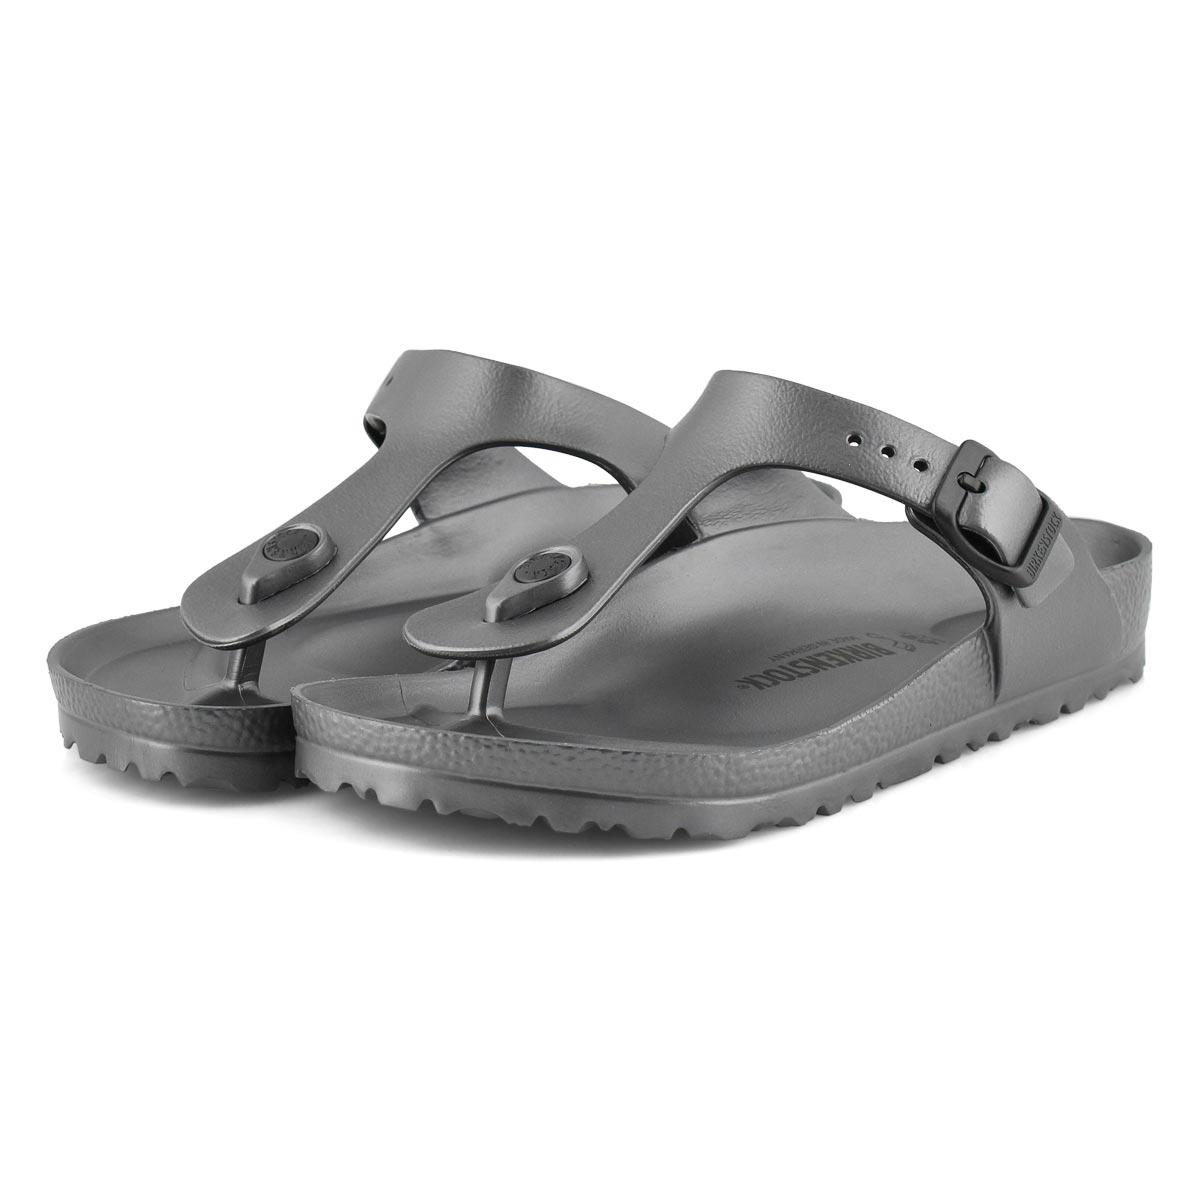 Sandale tong Gizeh EVA, anthrac mét, fem